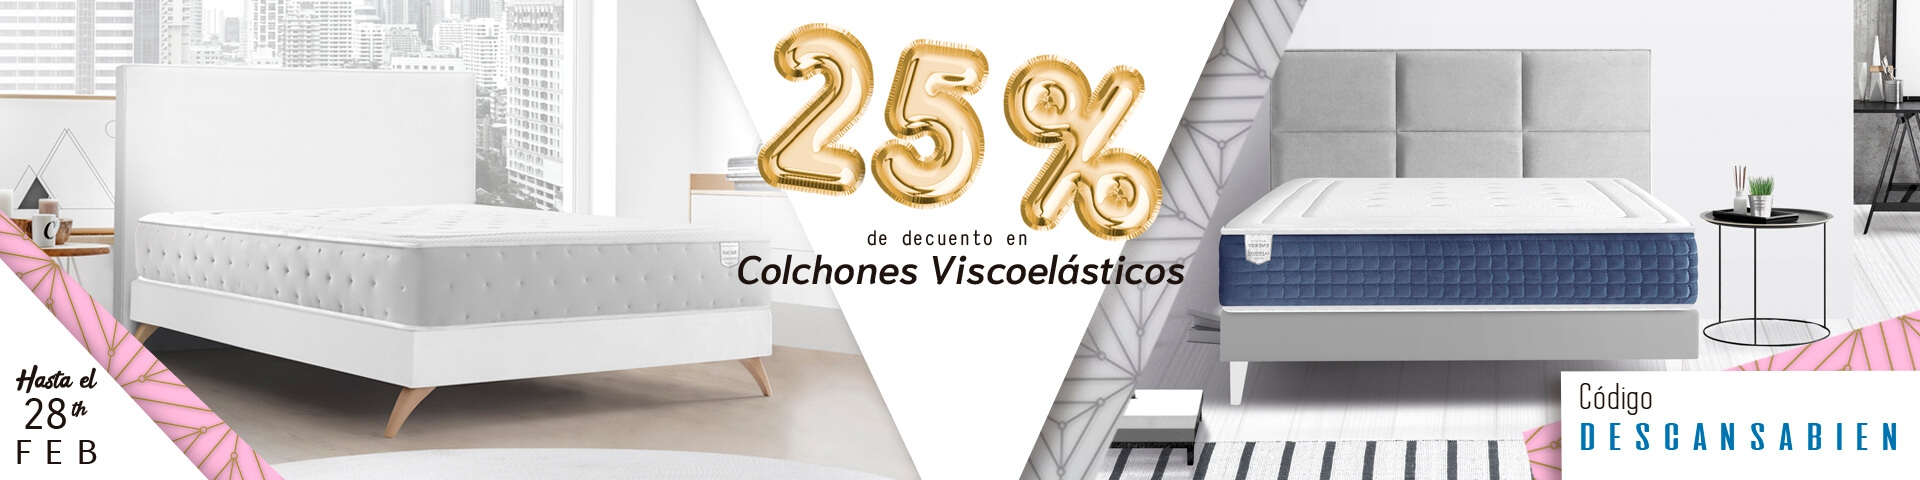 Promo Colchones